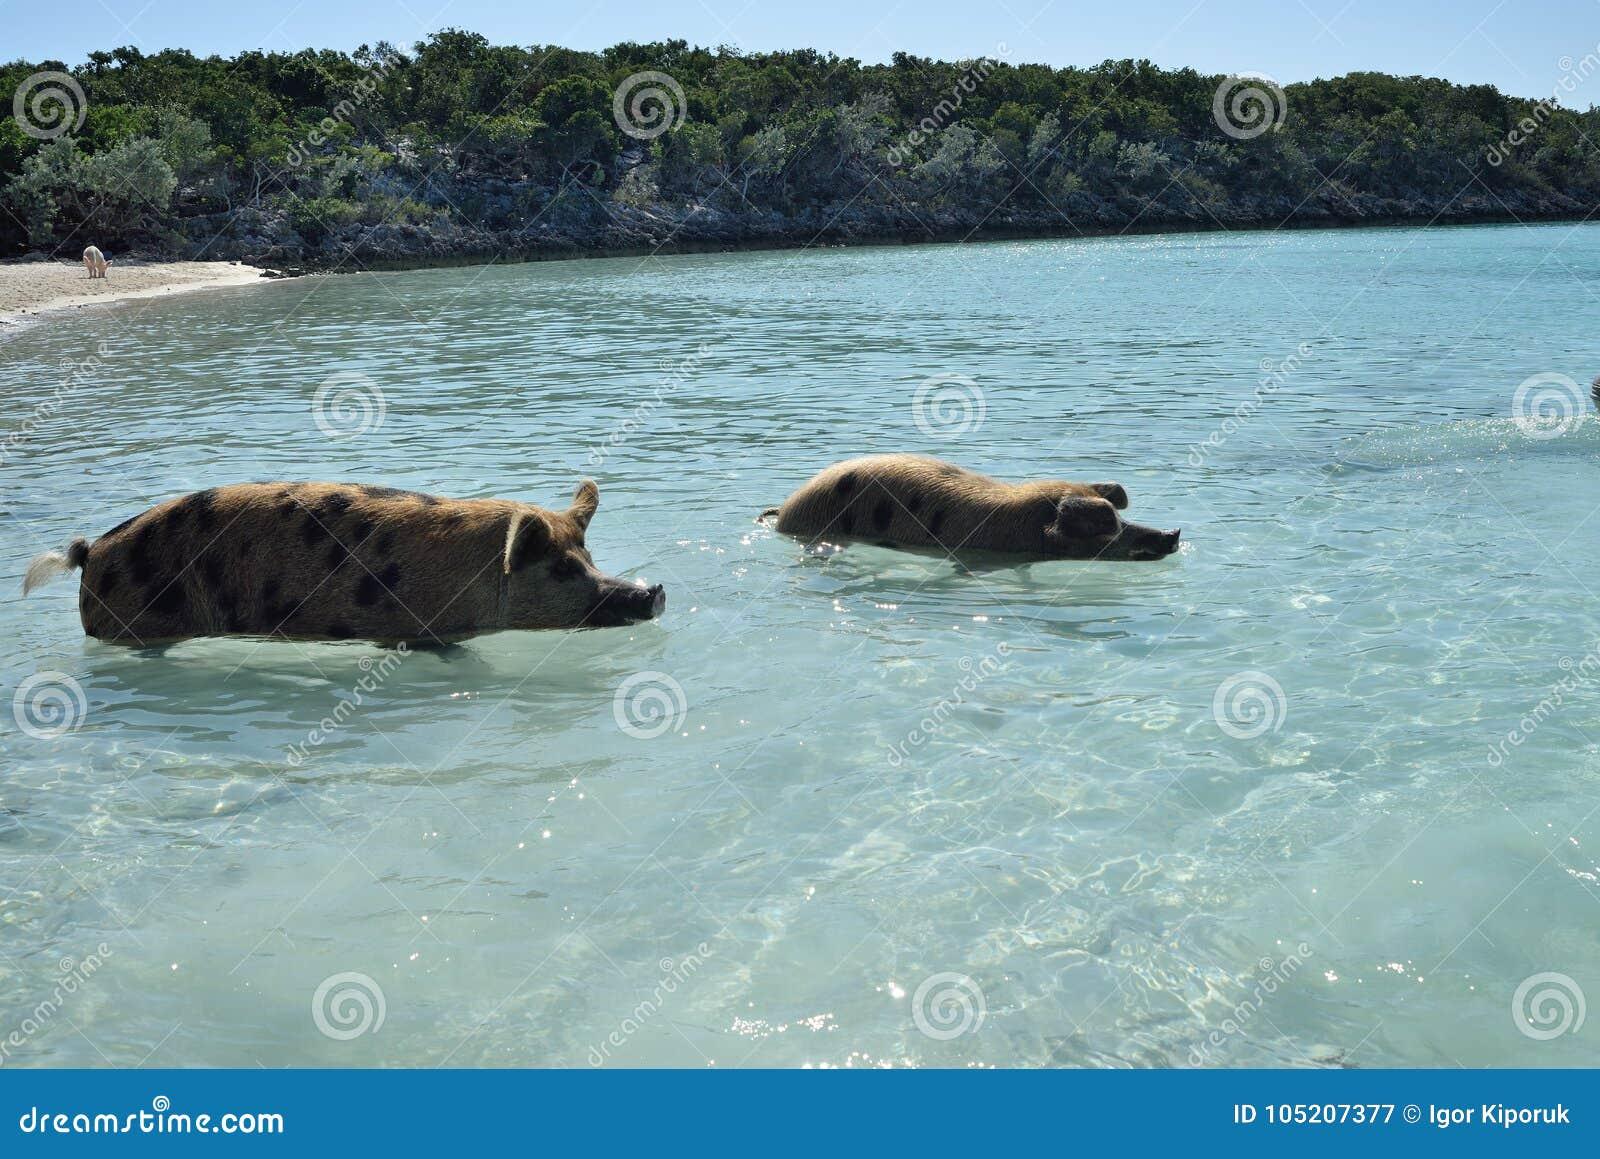 Pig beach  stock image  Image of tourists, exuma, bank